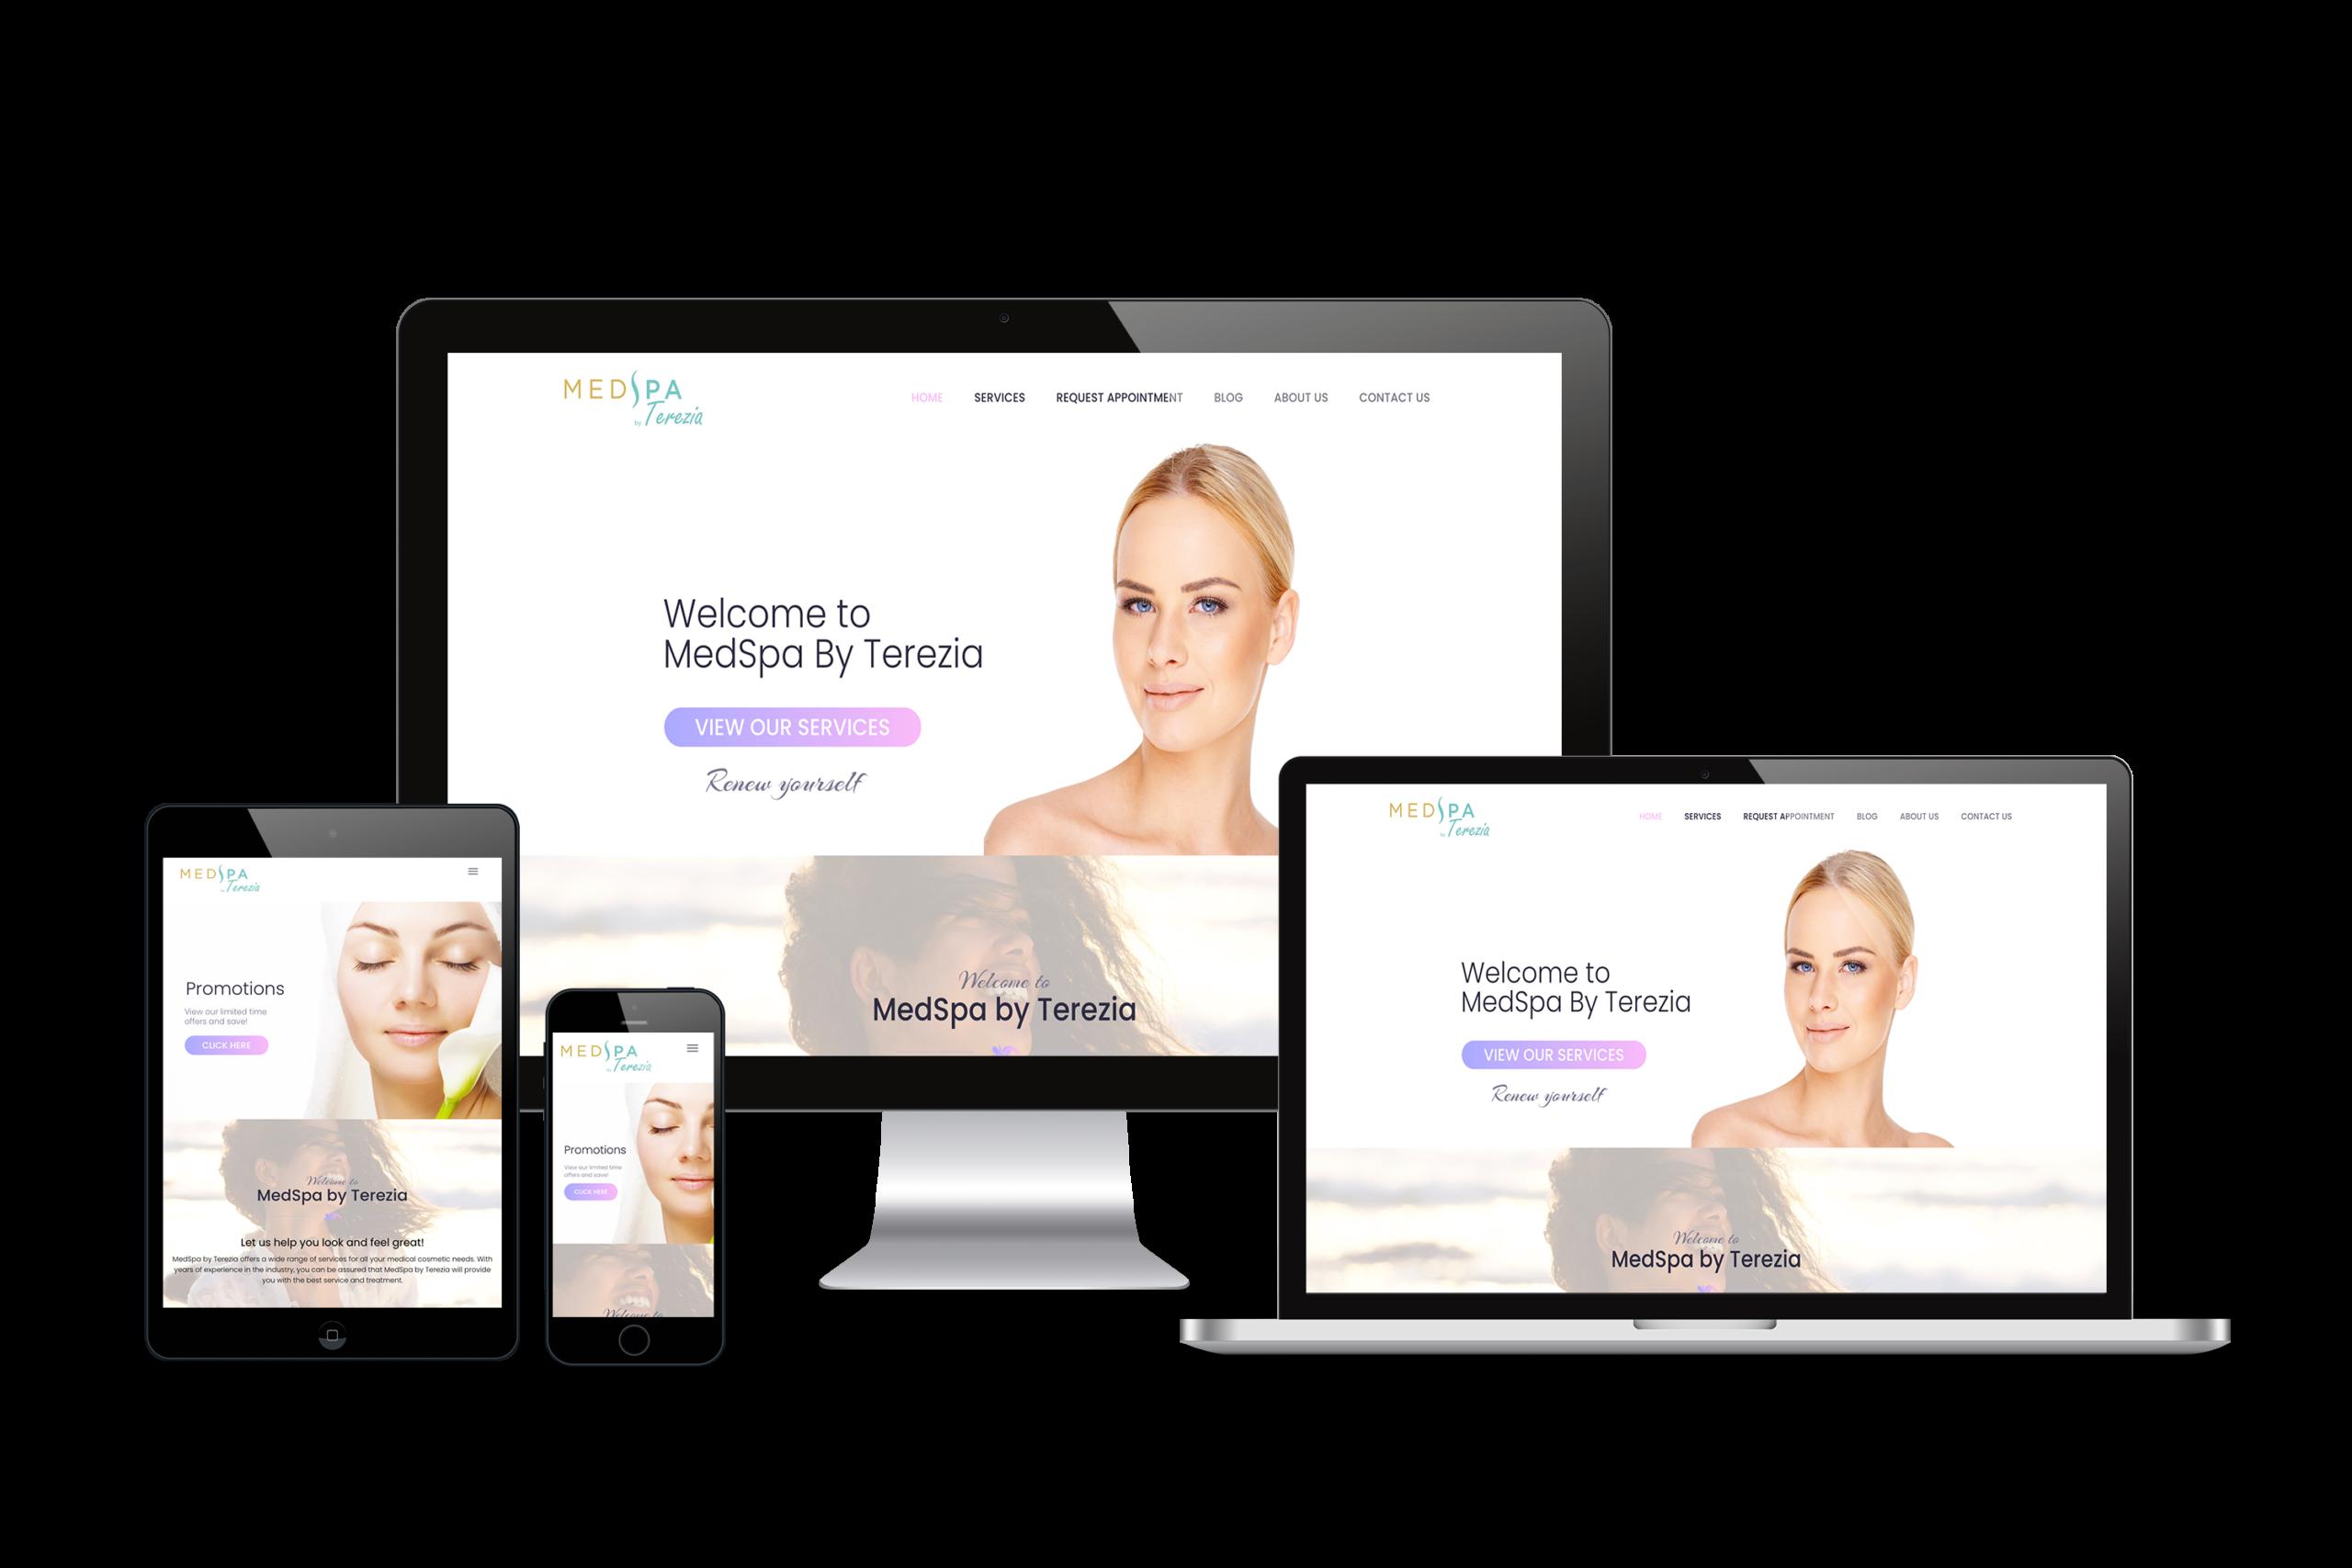 MedSpa-By-Terezia-Web-Design